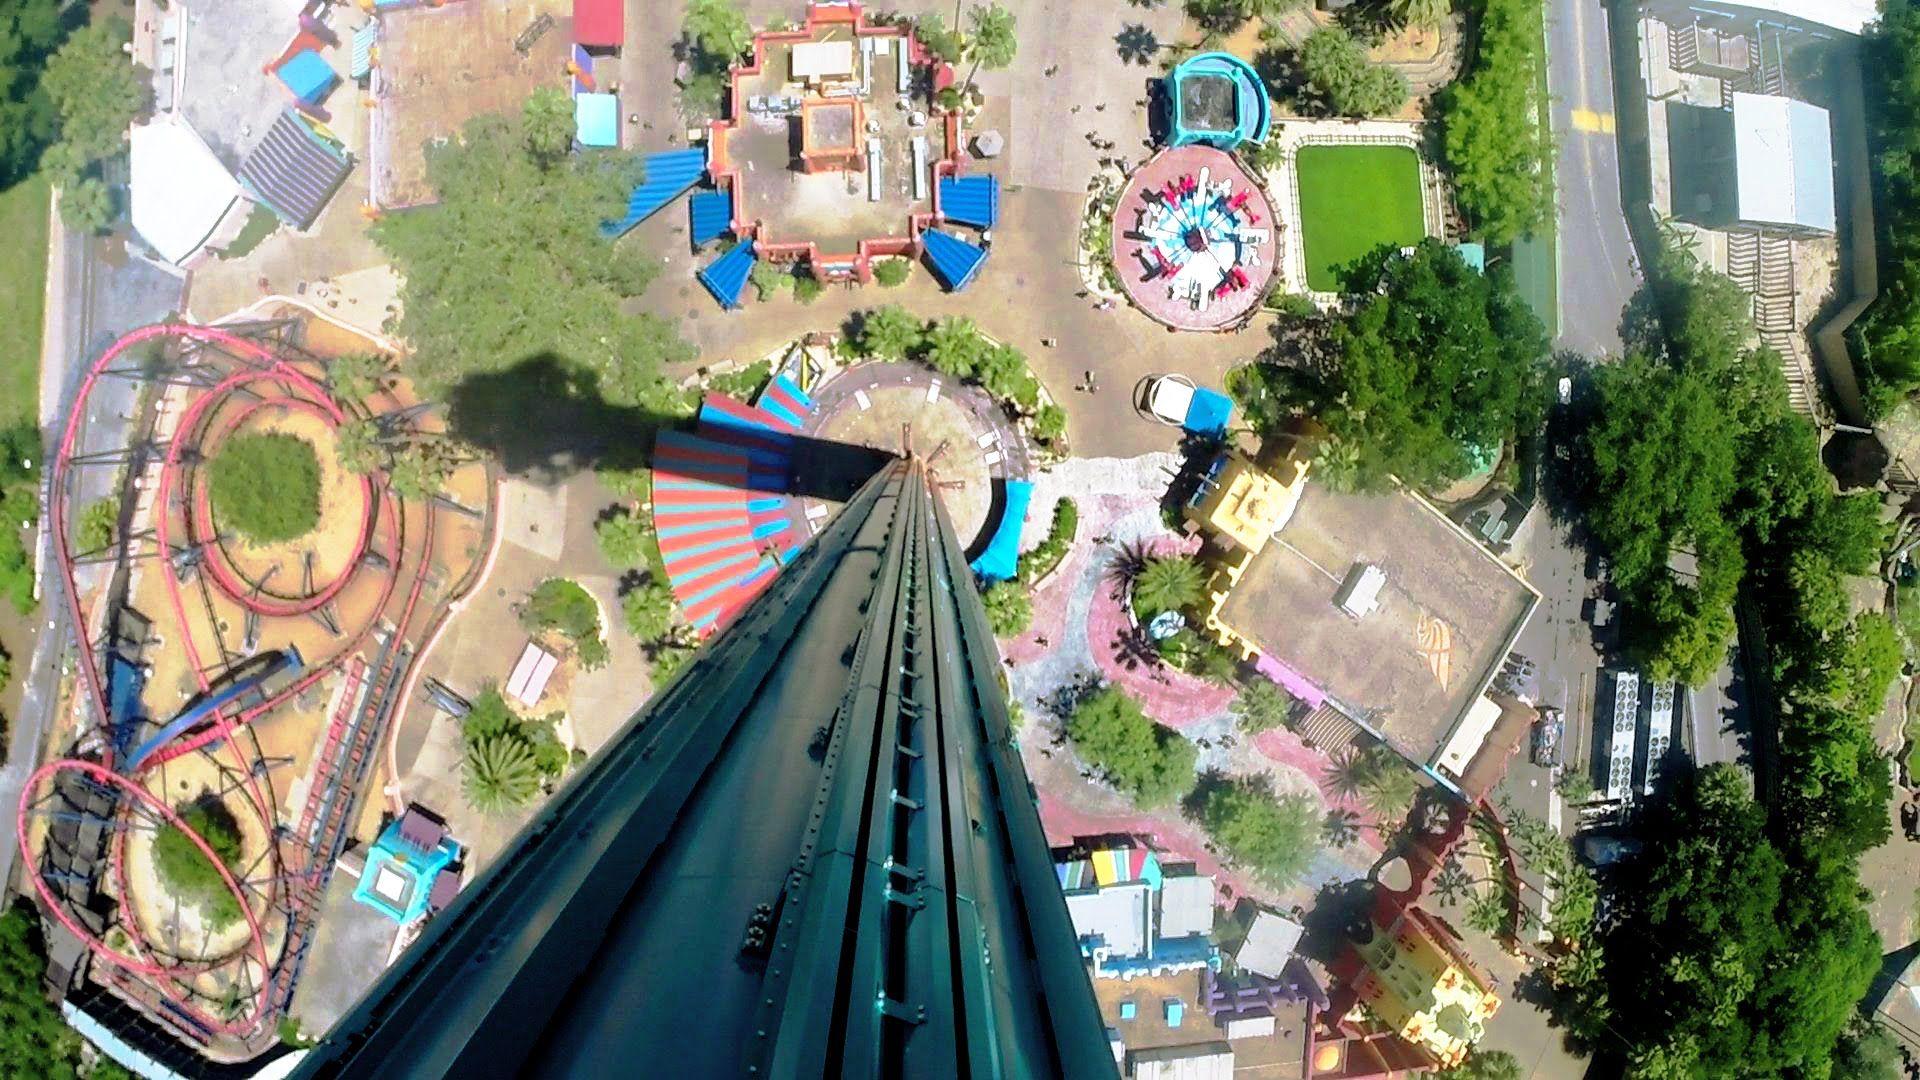 aabf2af71df6236cc534c285af8e9b4f - Land Of The Dragons Busch Gardens Tampa